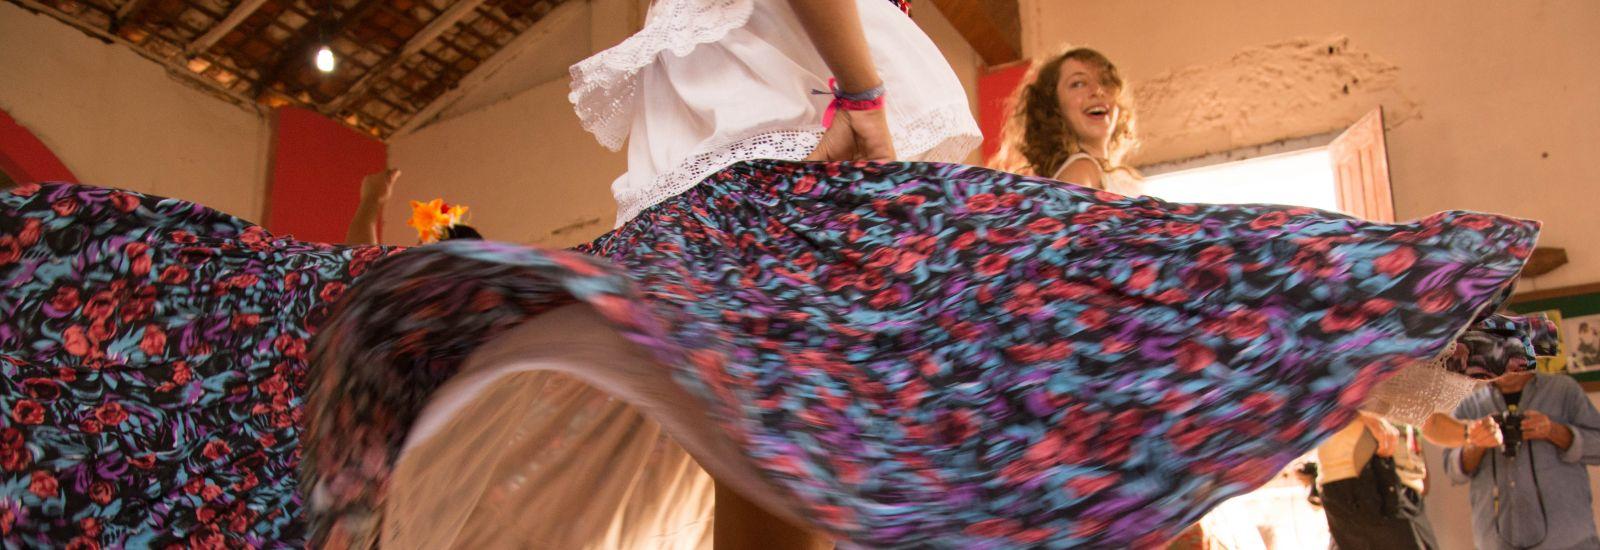 Carimbo dancers of Marajó teach Dr Bronwyn Tarr their traditional dance Image credit: Emanoela Neves